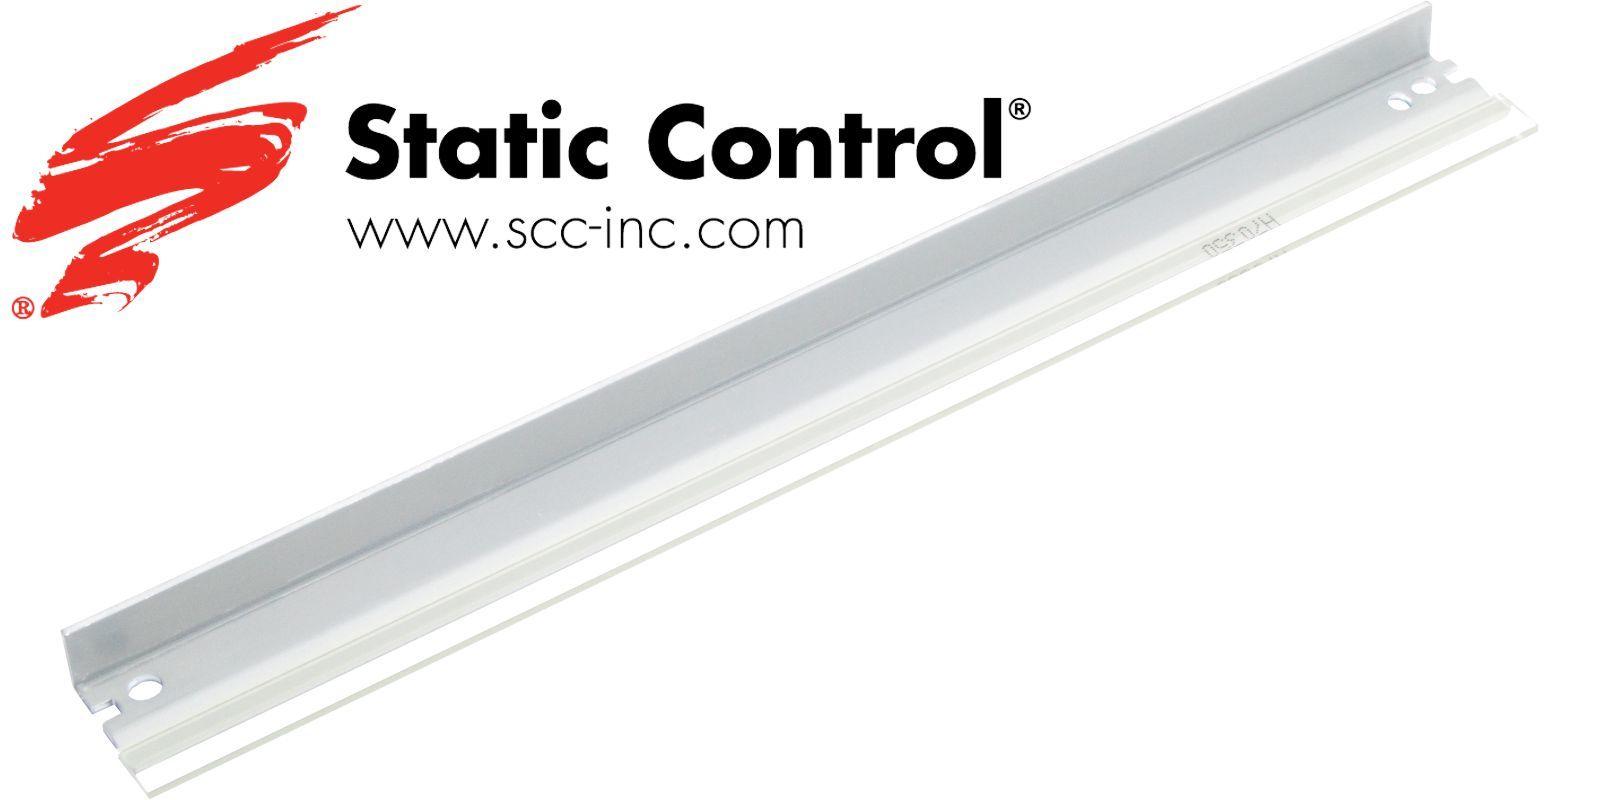 Ракель Static Control© WB CB540A/CE320A (HP451BLADE-10) Wiper Blade - чистящее лезвие.